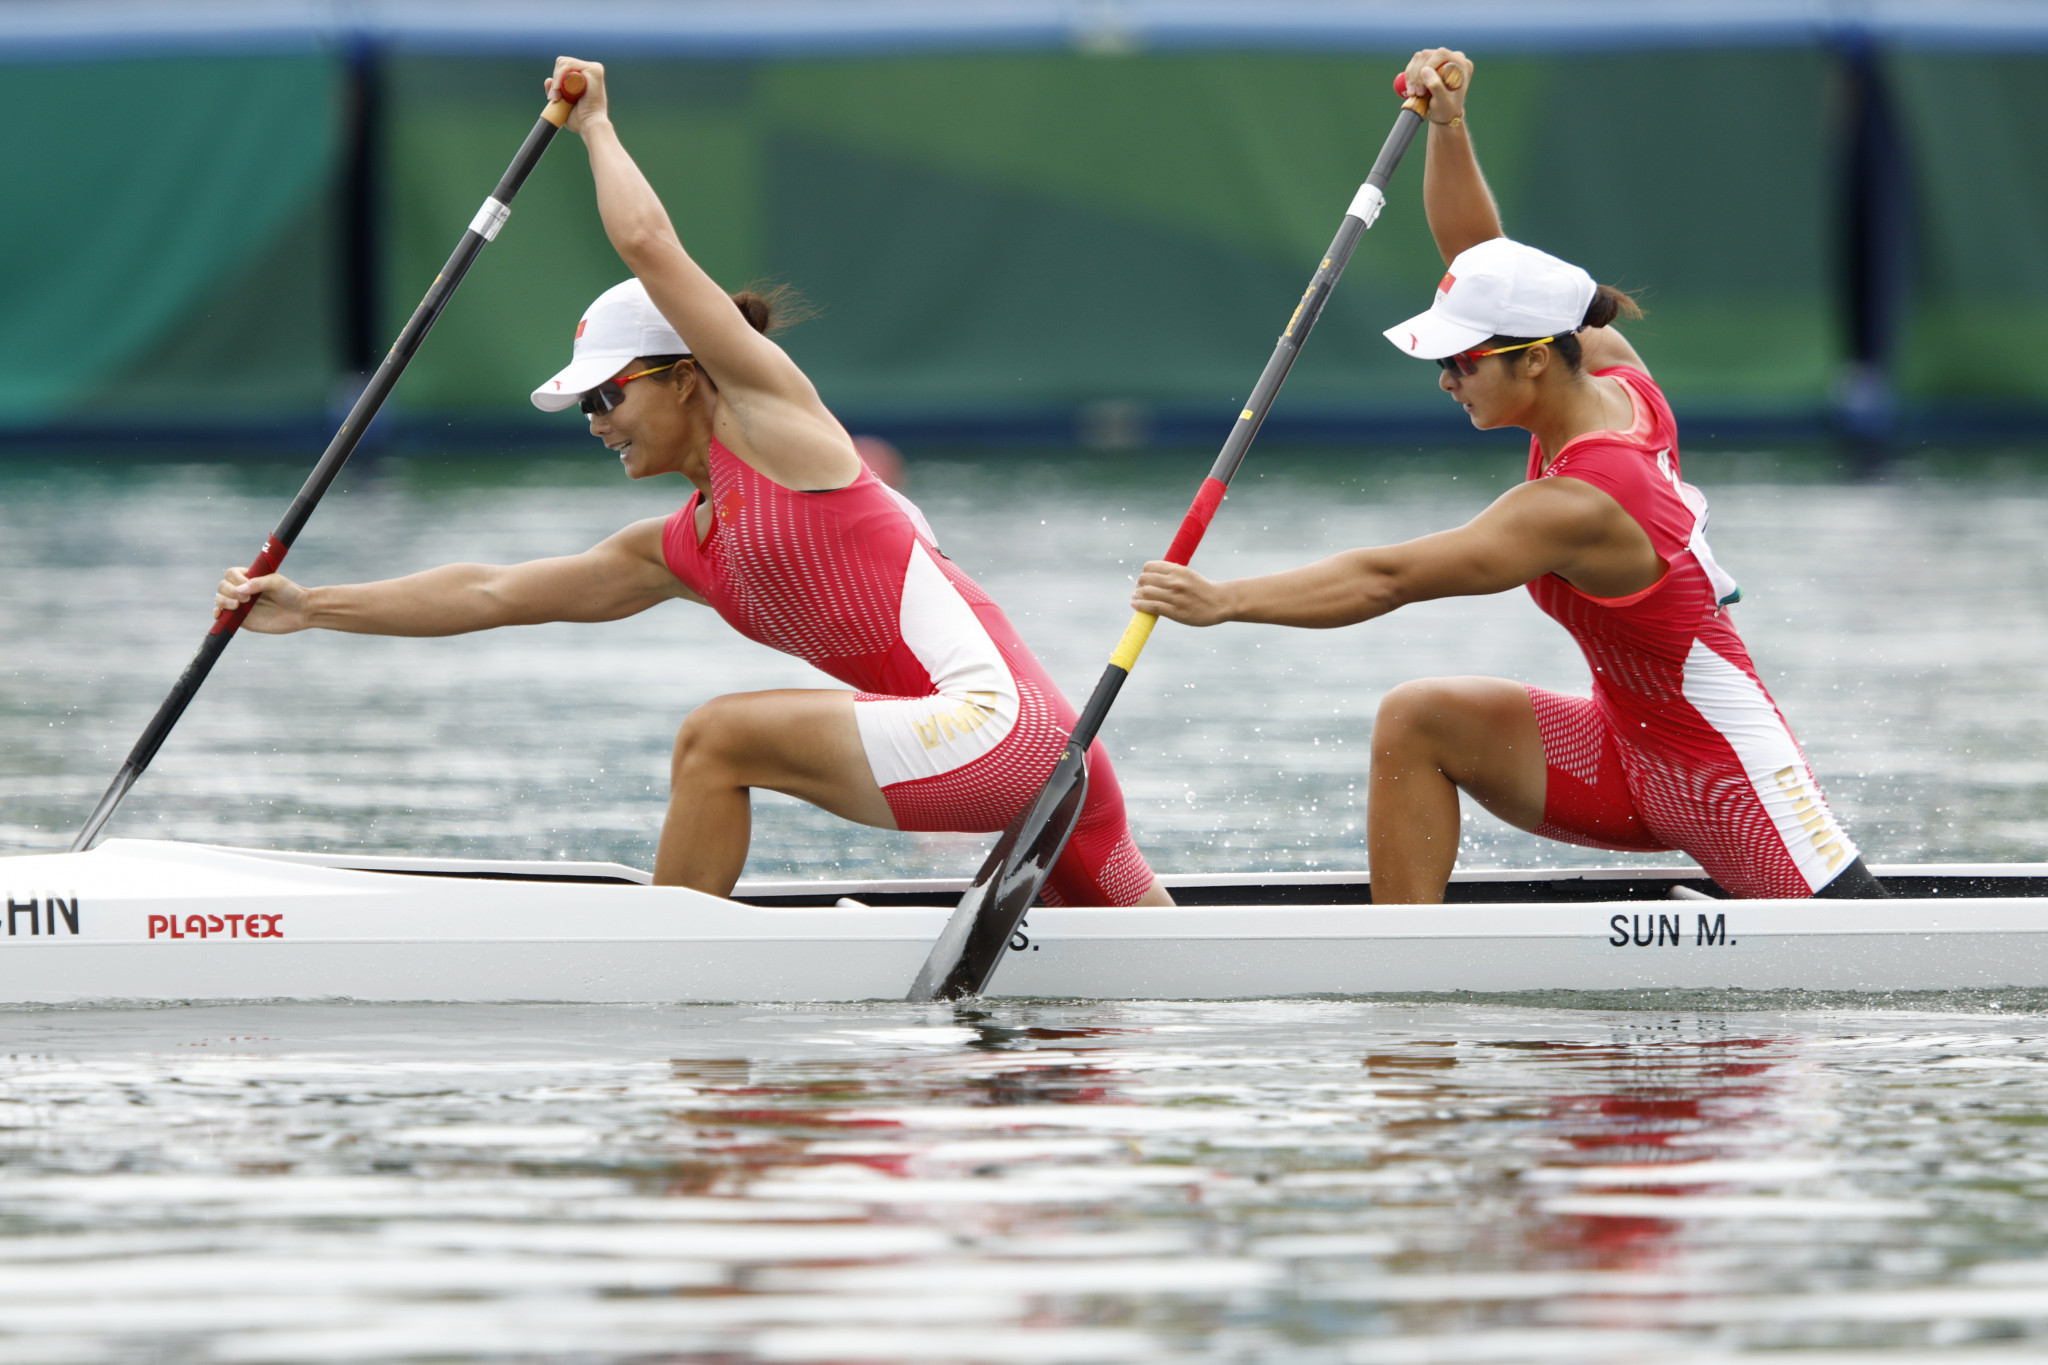 Sophia Jensen leads canoe sprinters at Junior and Under-23 Canoe Sprint World Championships